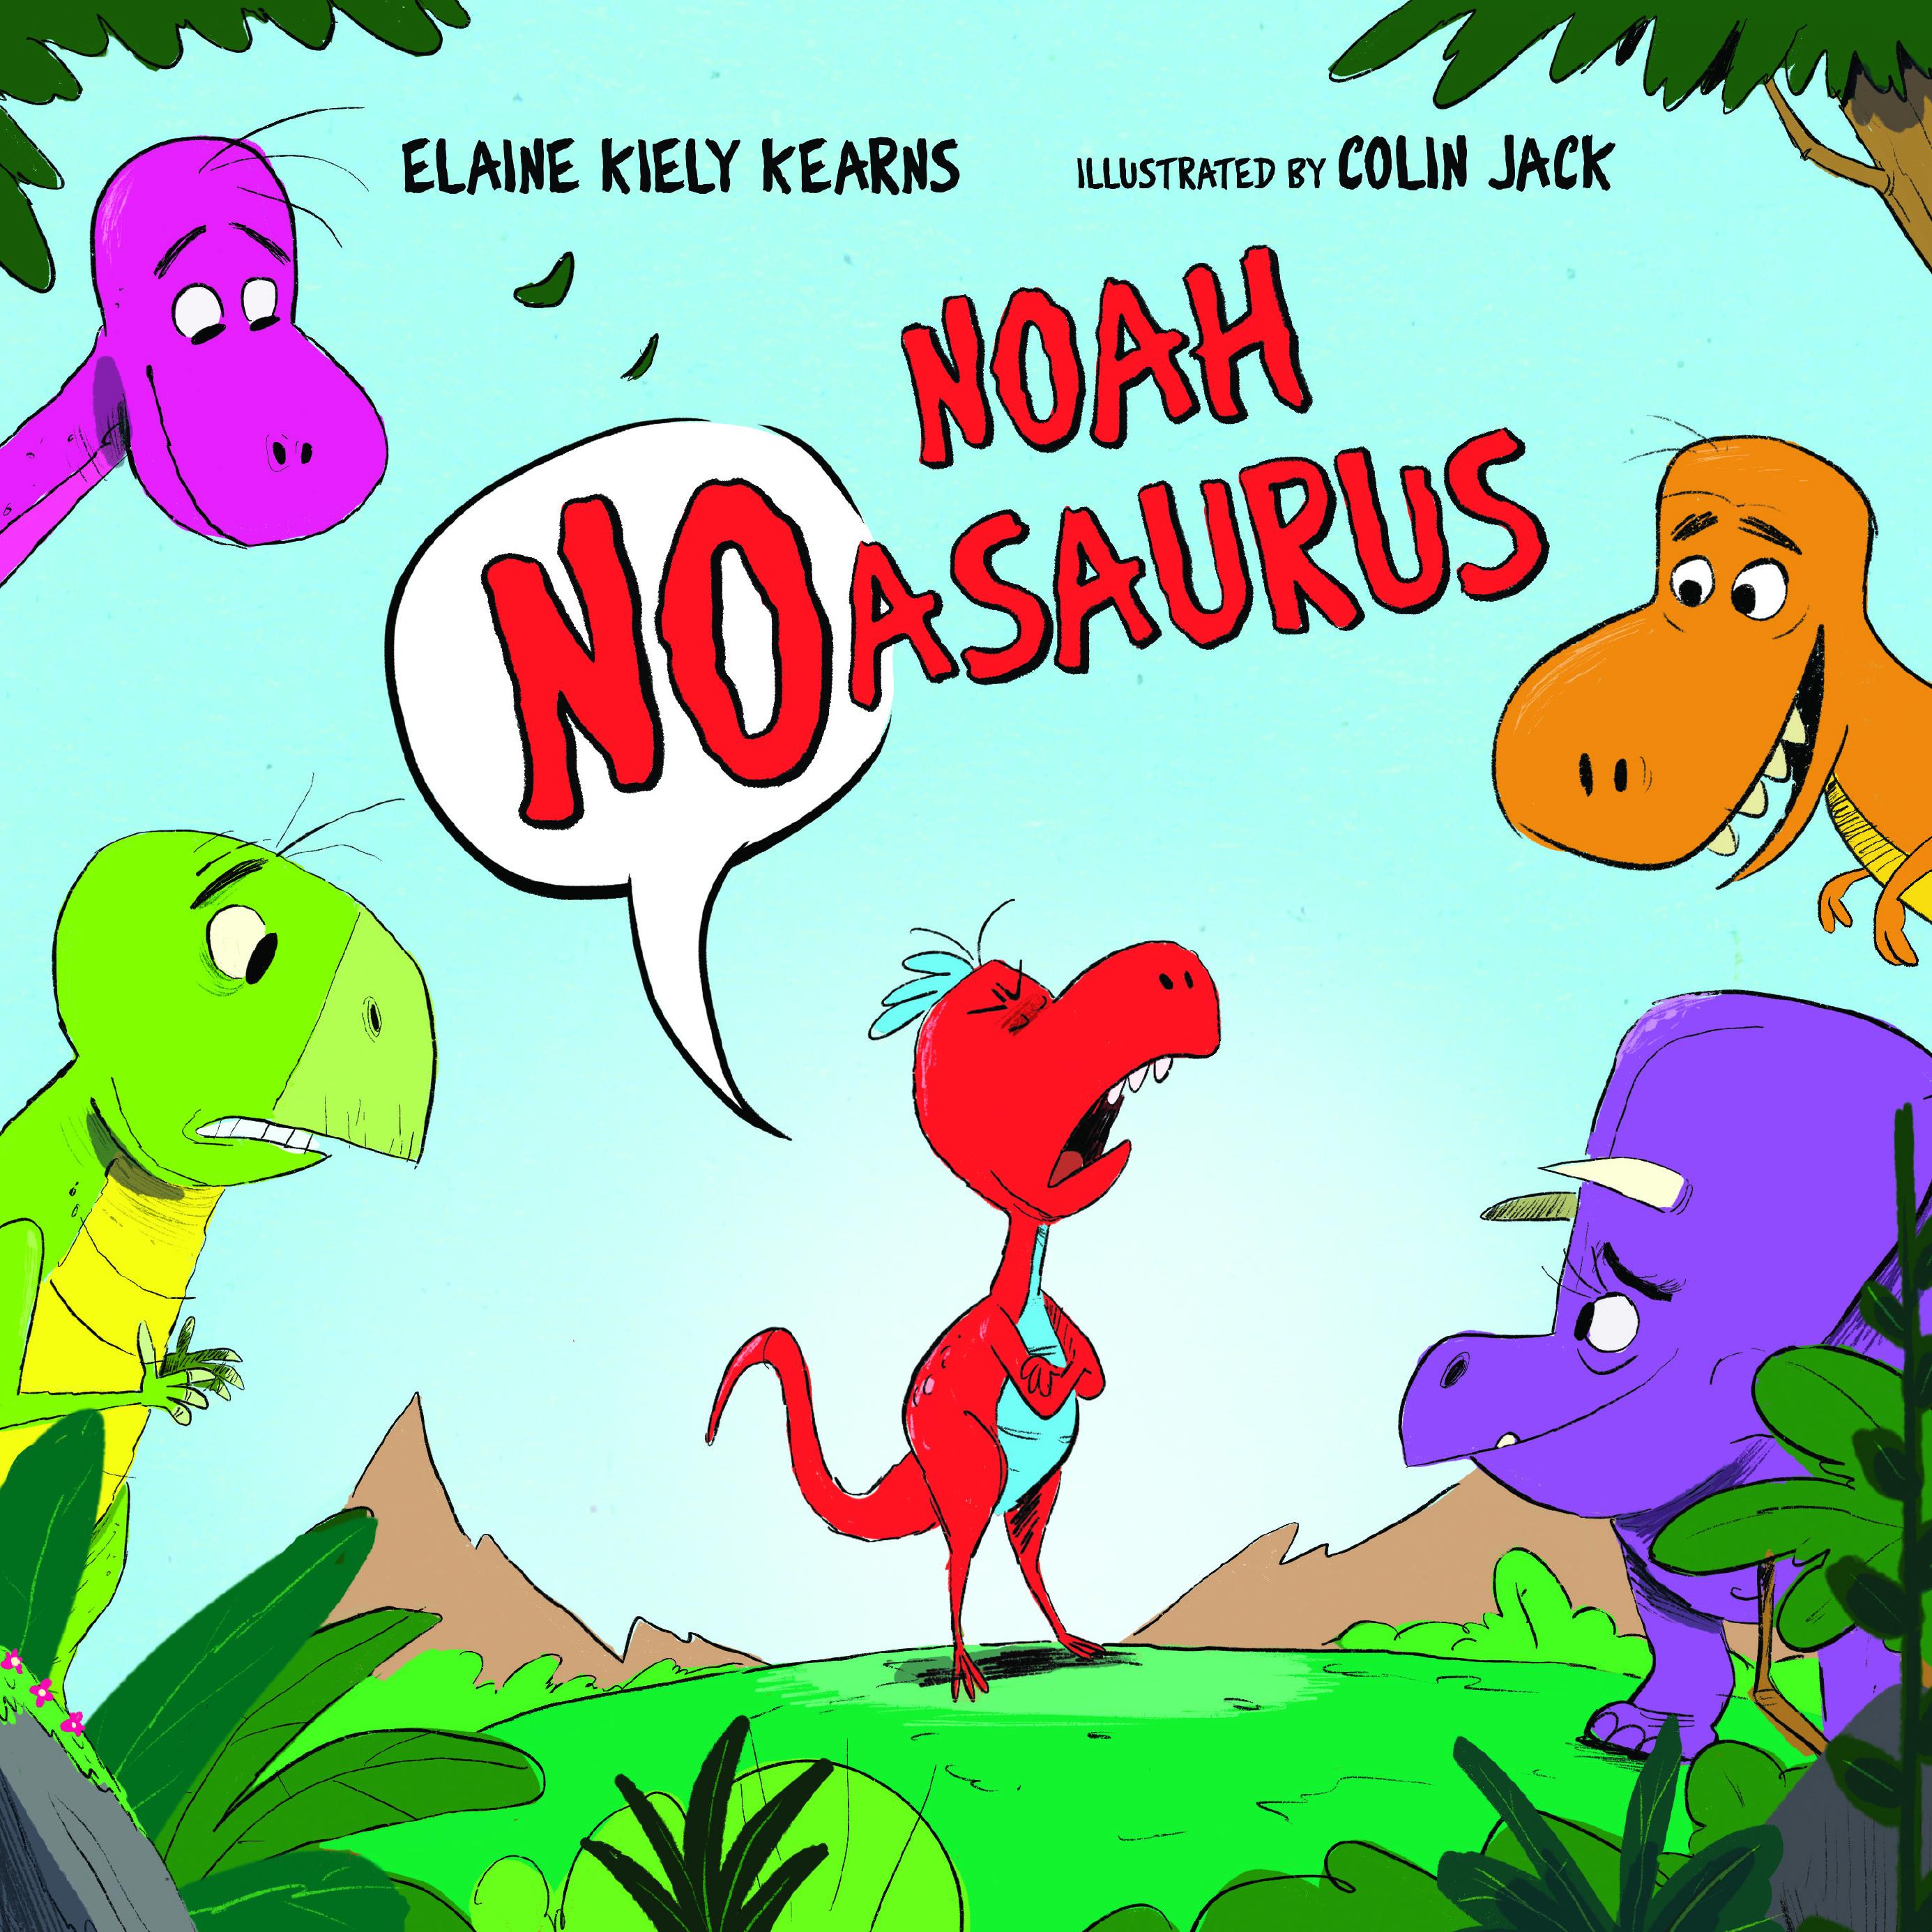 NOAH NOASAURUS